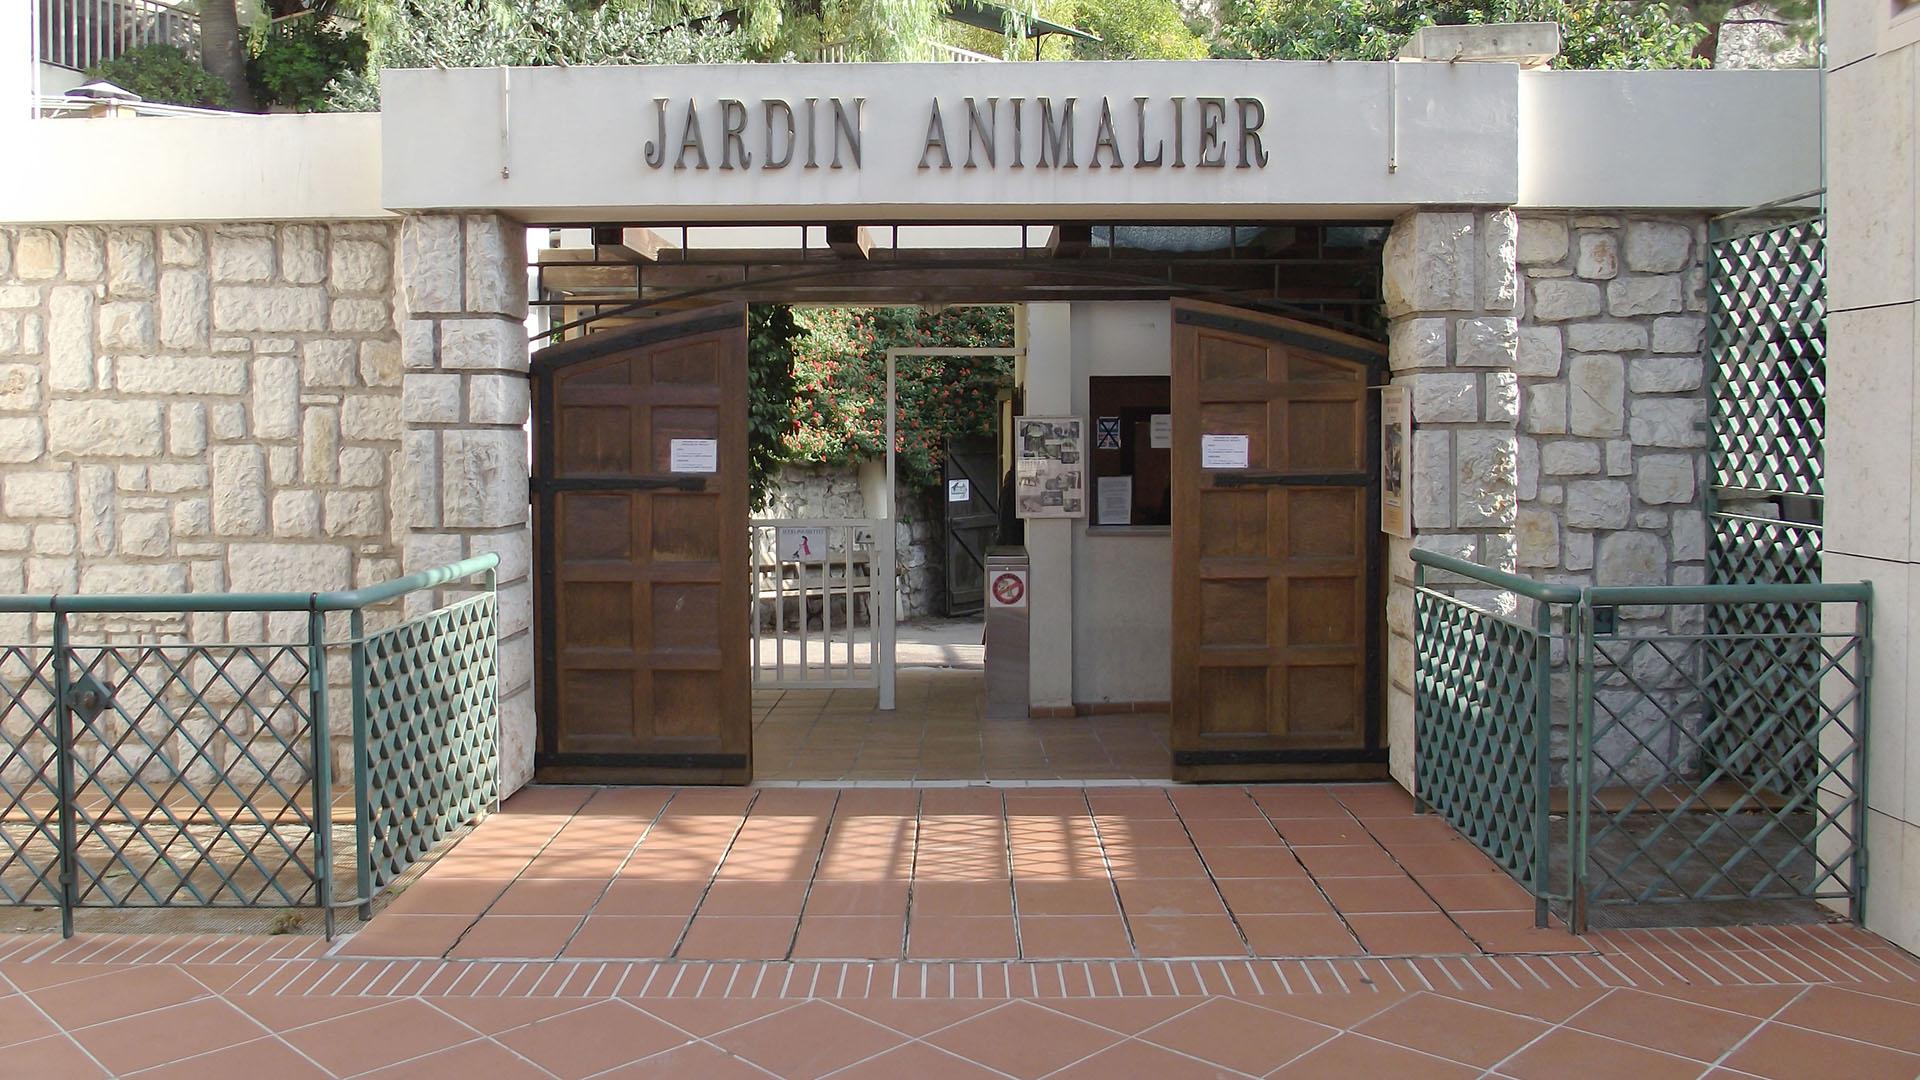 The zoo - Le Jardin Animalier de Monaco